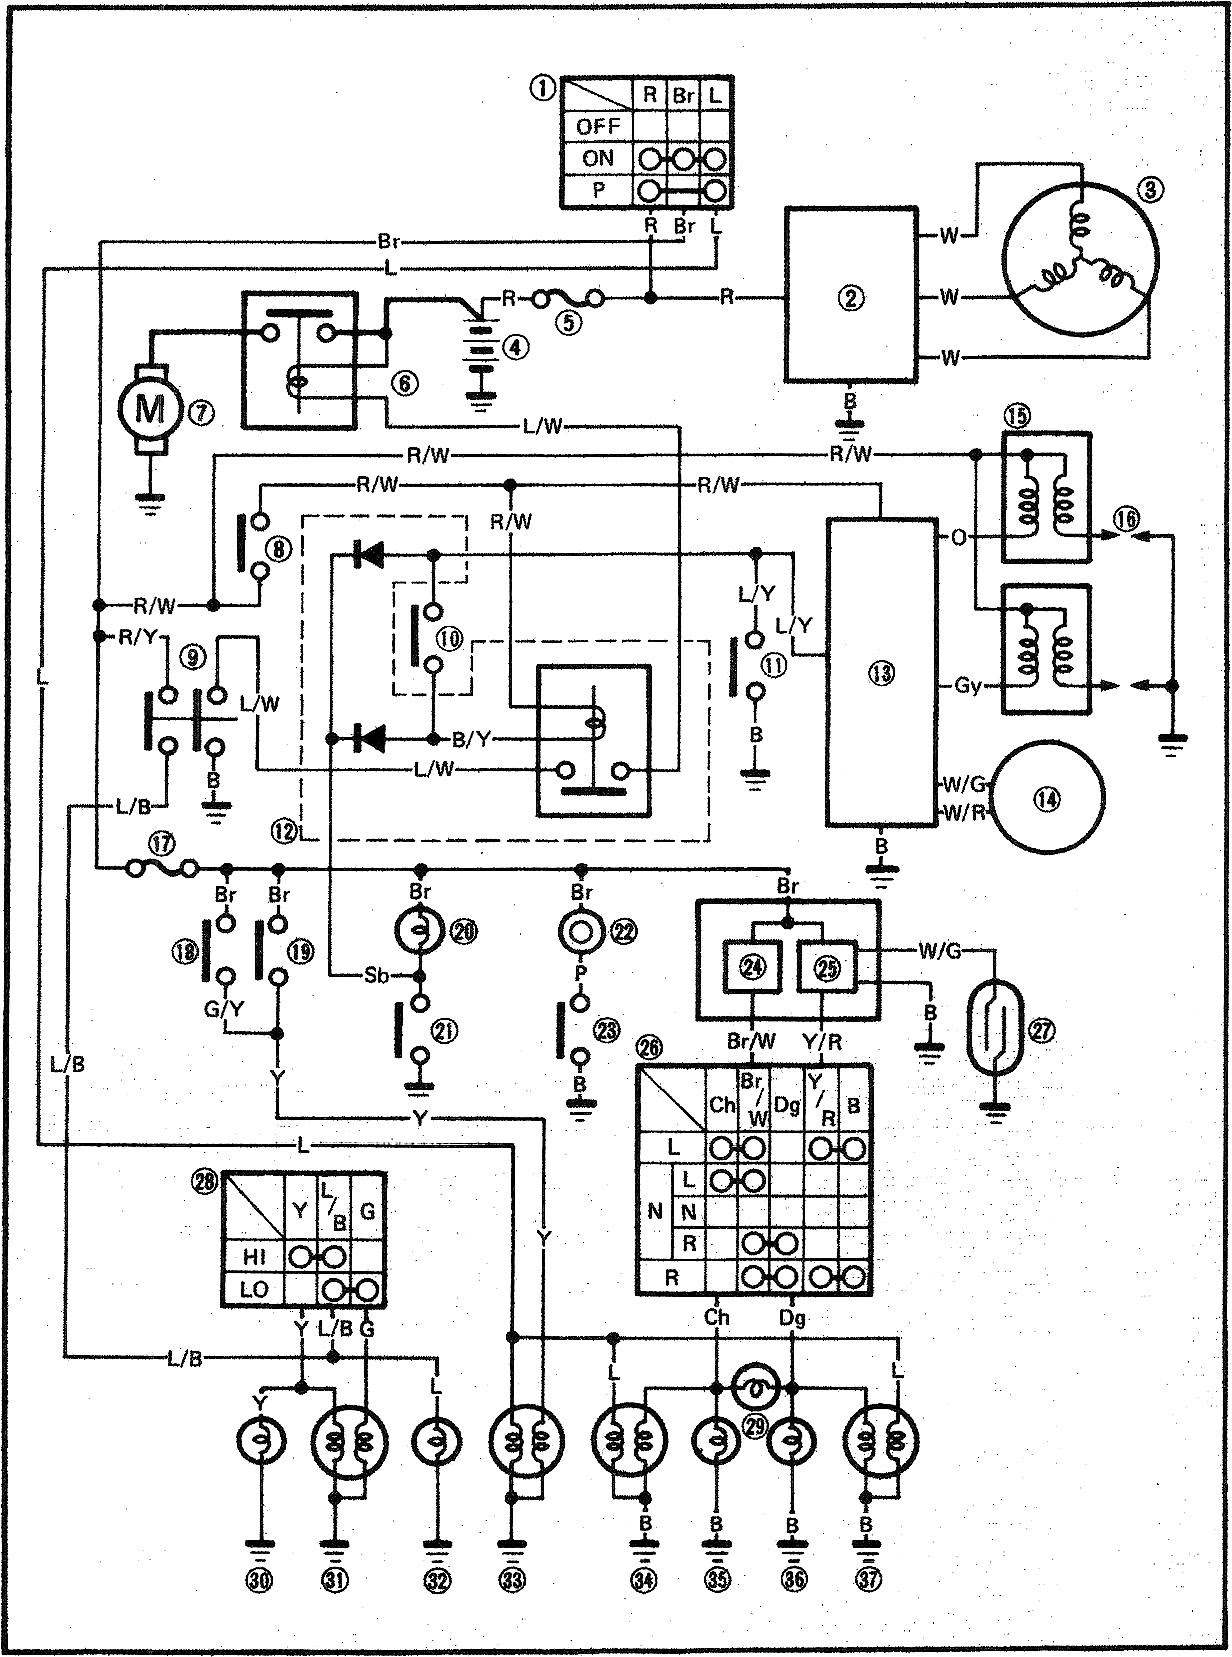 [DIAGRAM] Yamaha Virago Wiring Diagram FULL Version HD